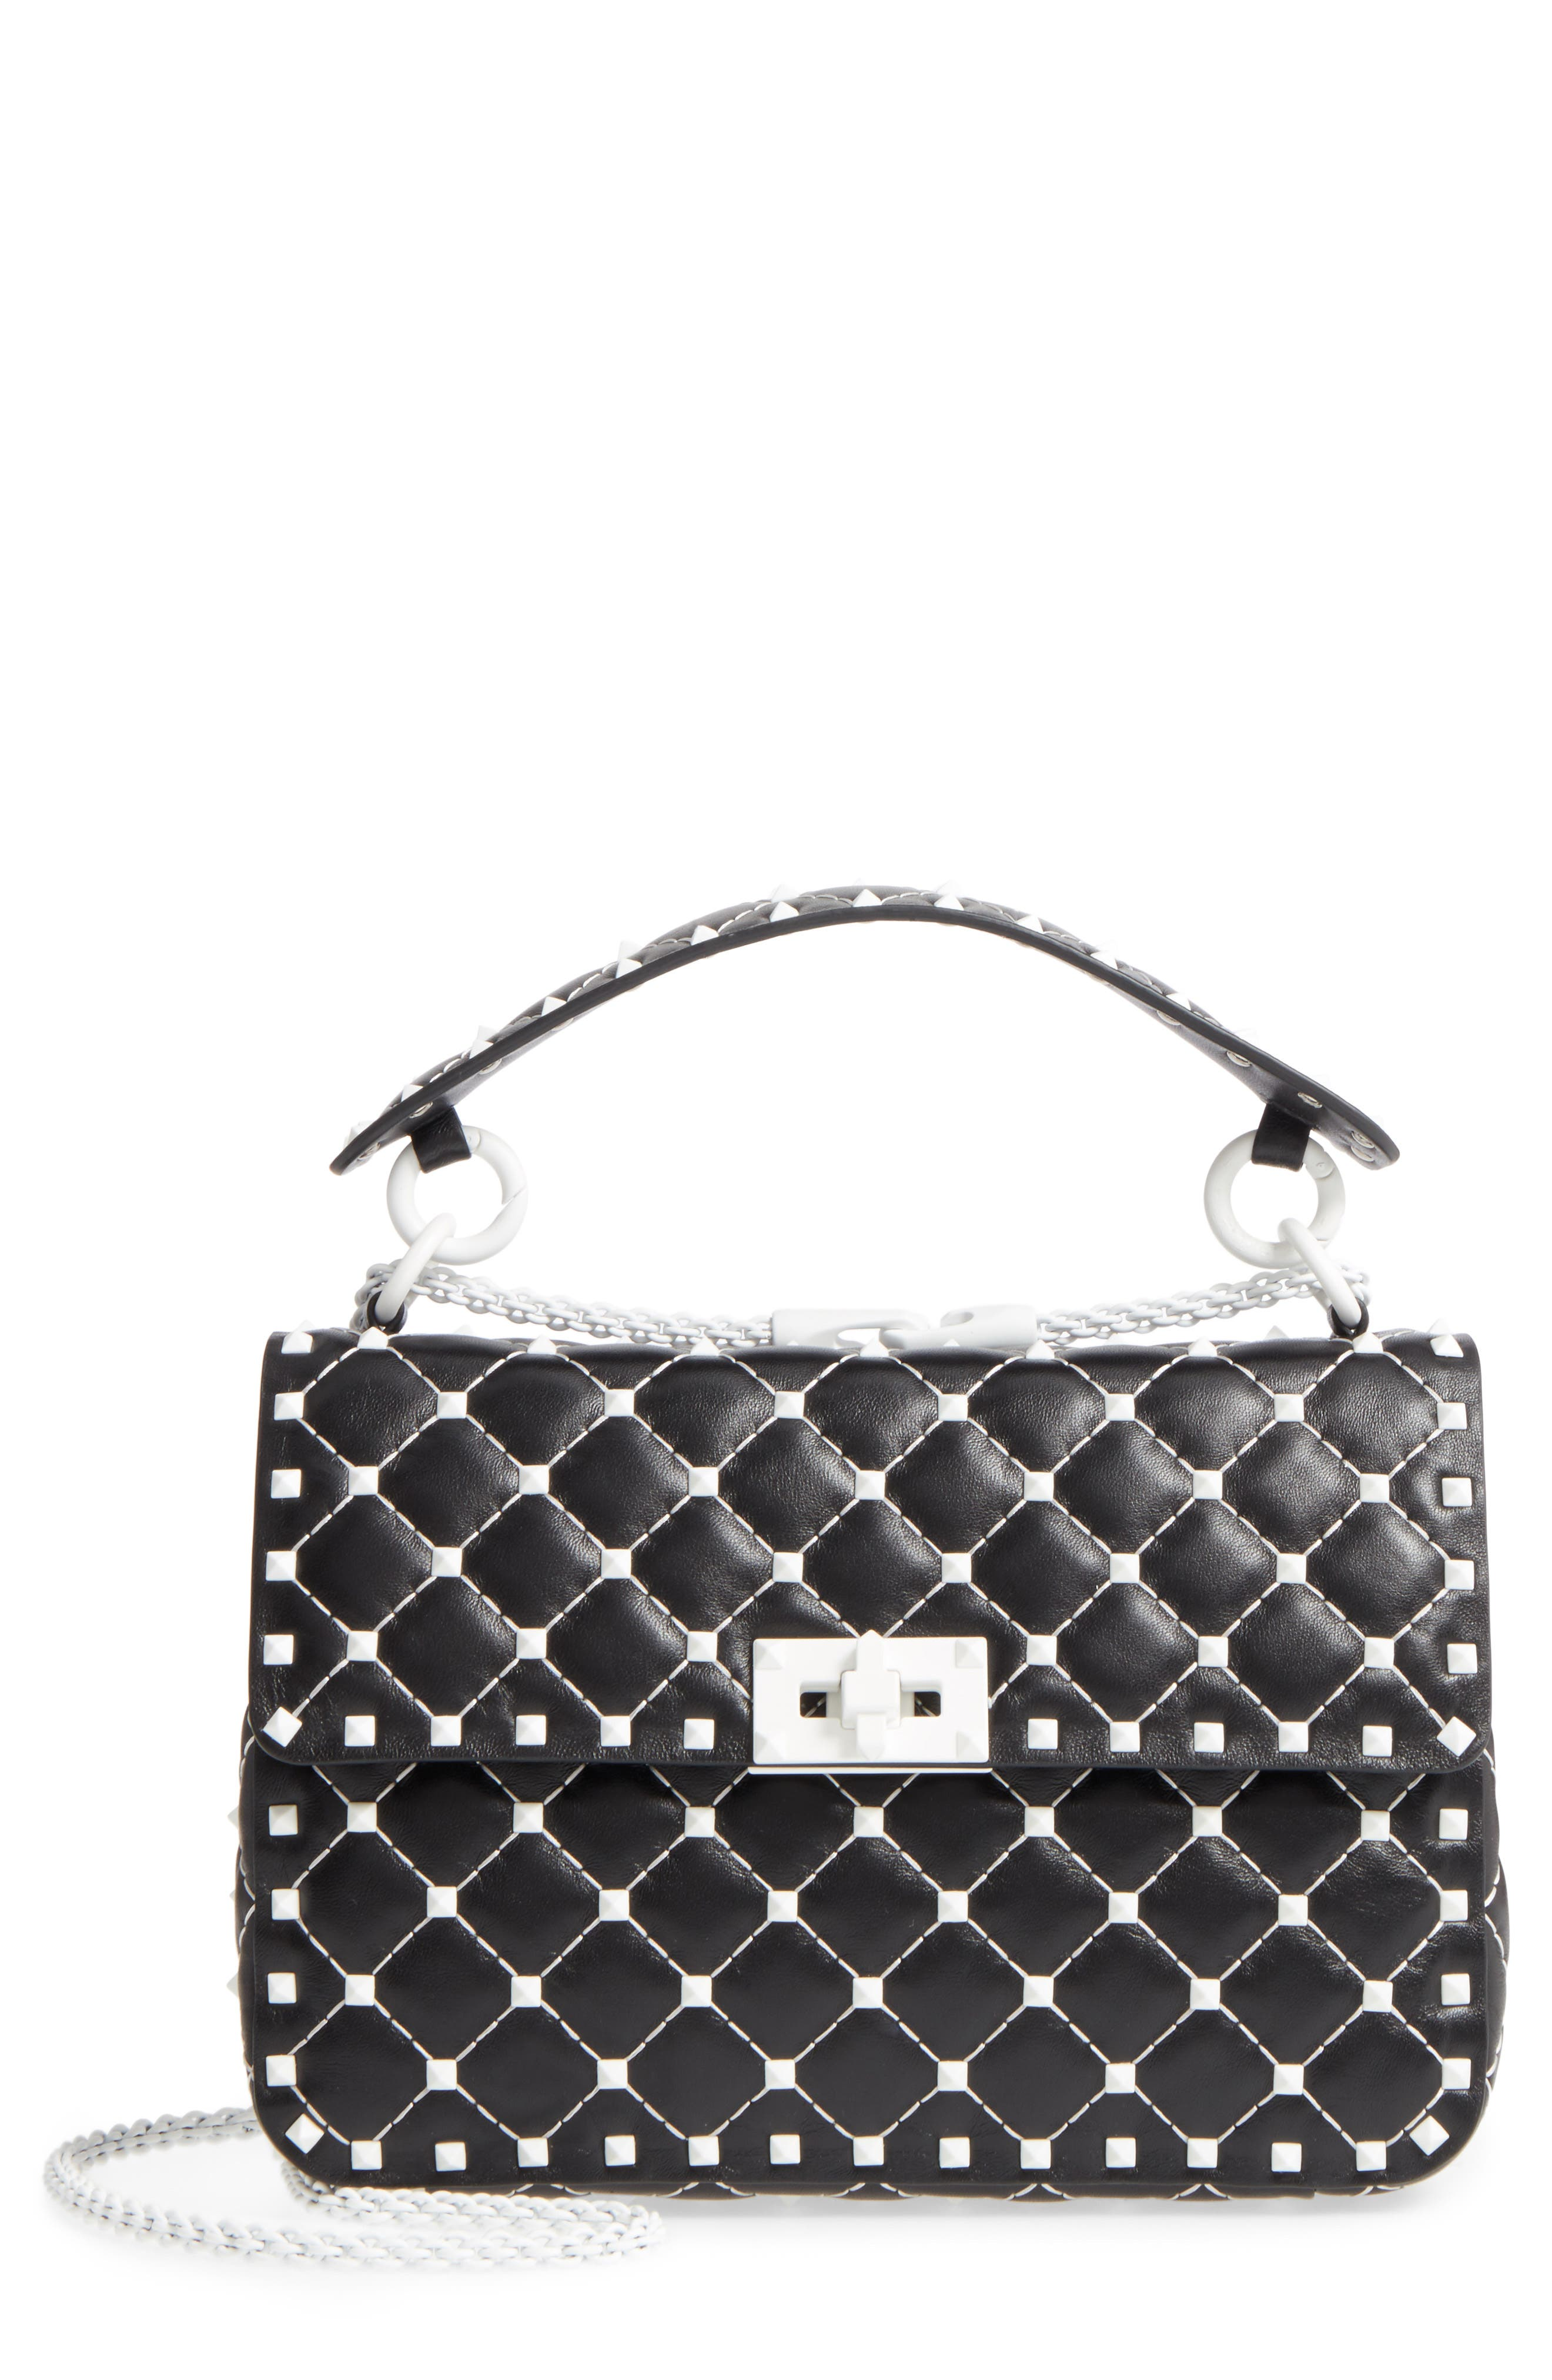 Medium Rockstud Matelassé Leather Shoulder Bag,                             Main thumbnail 1, color,                             Black